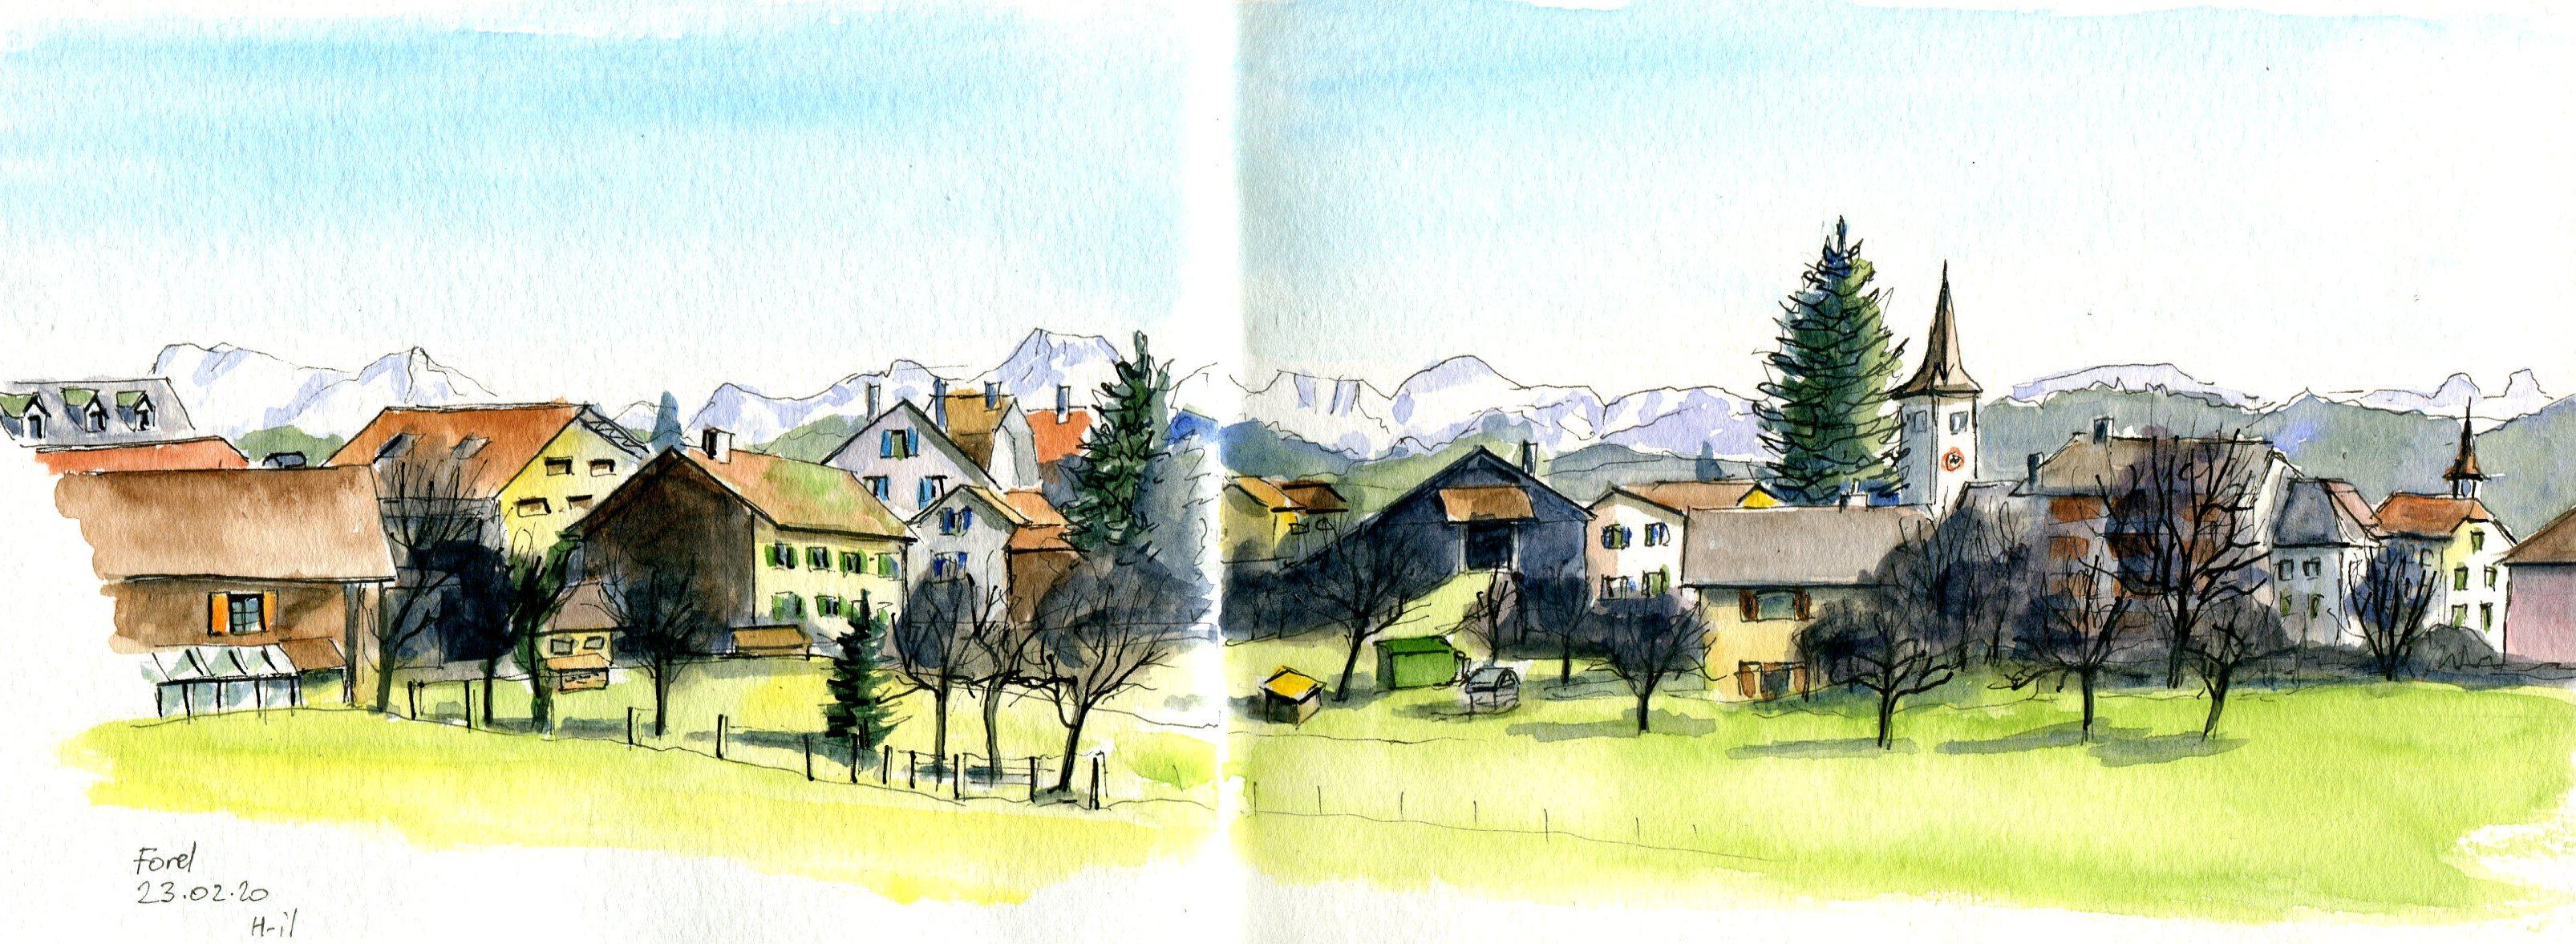 Forel village117